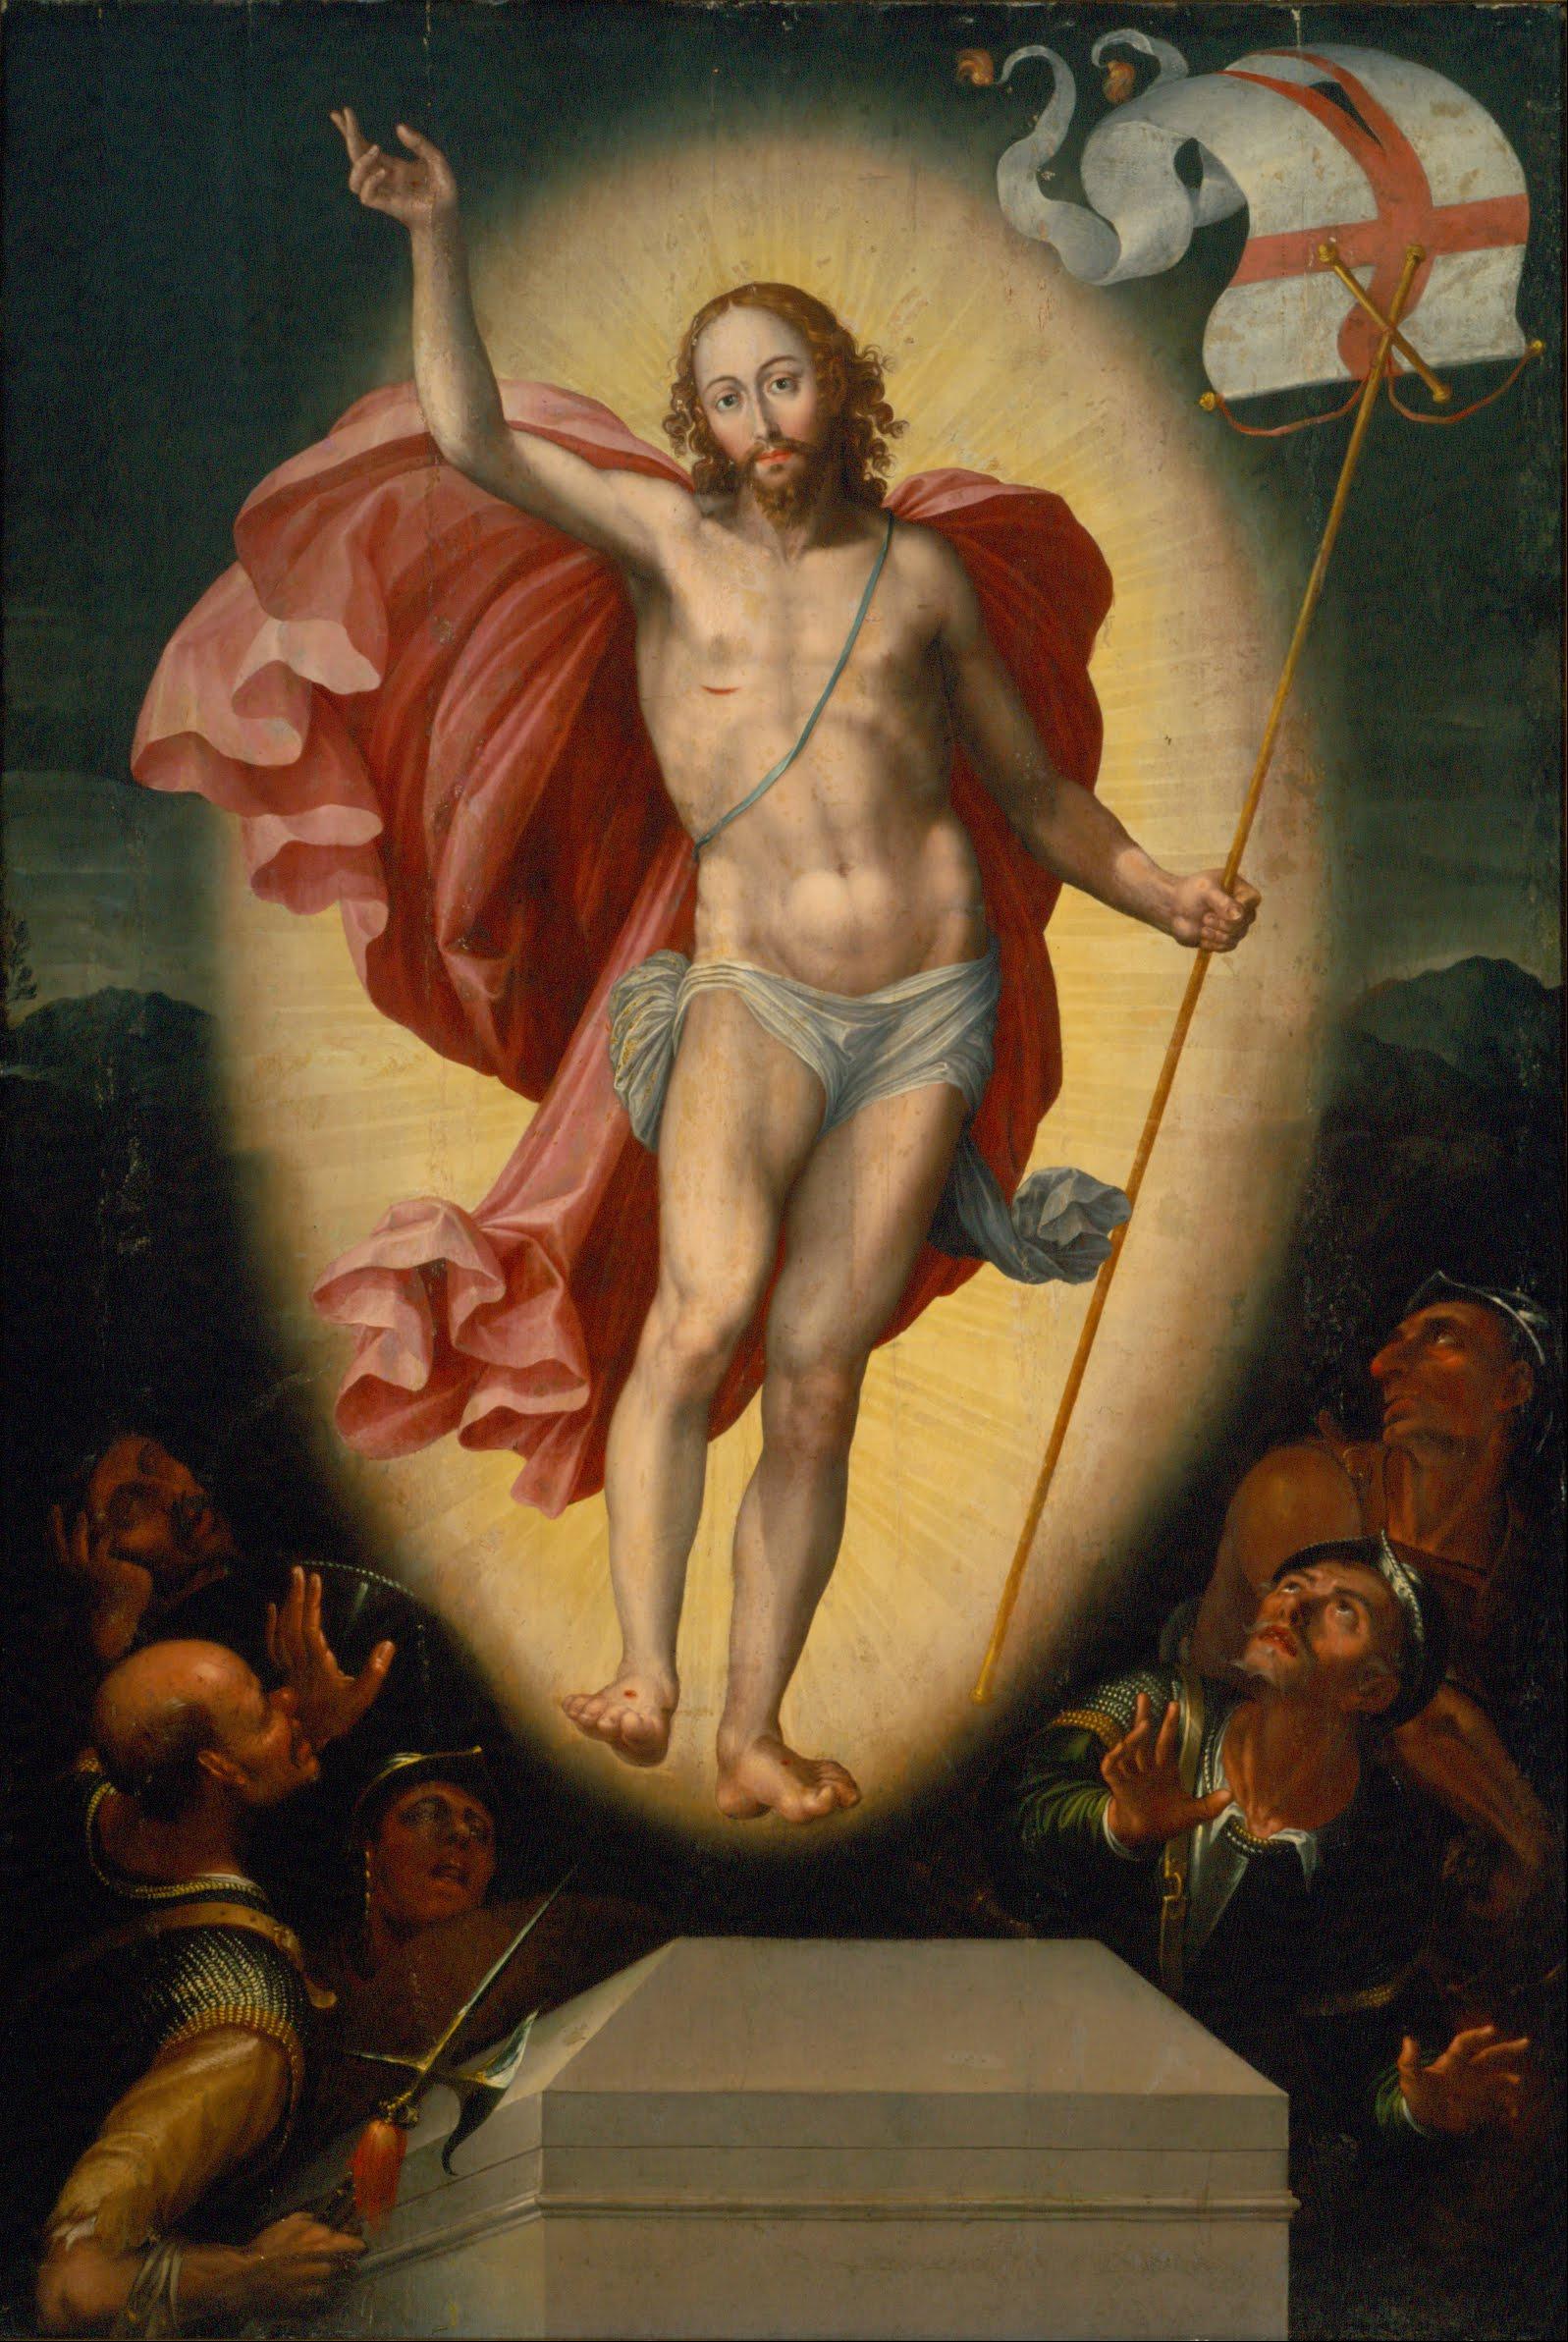 Alonso_López_de_Herrera_-_The_Resurrection_of_Christ_-_Google_Art_Project